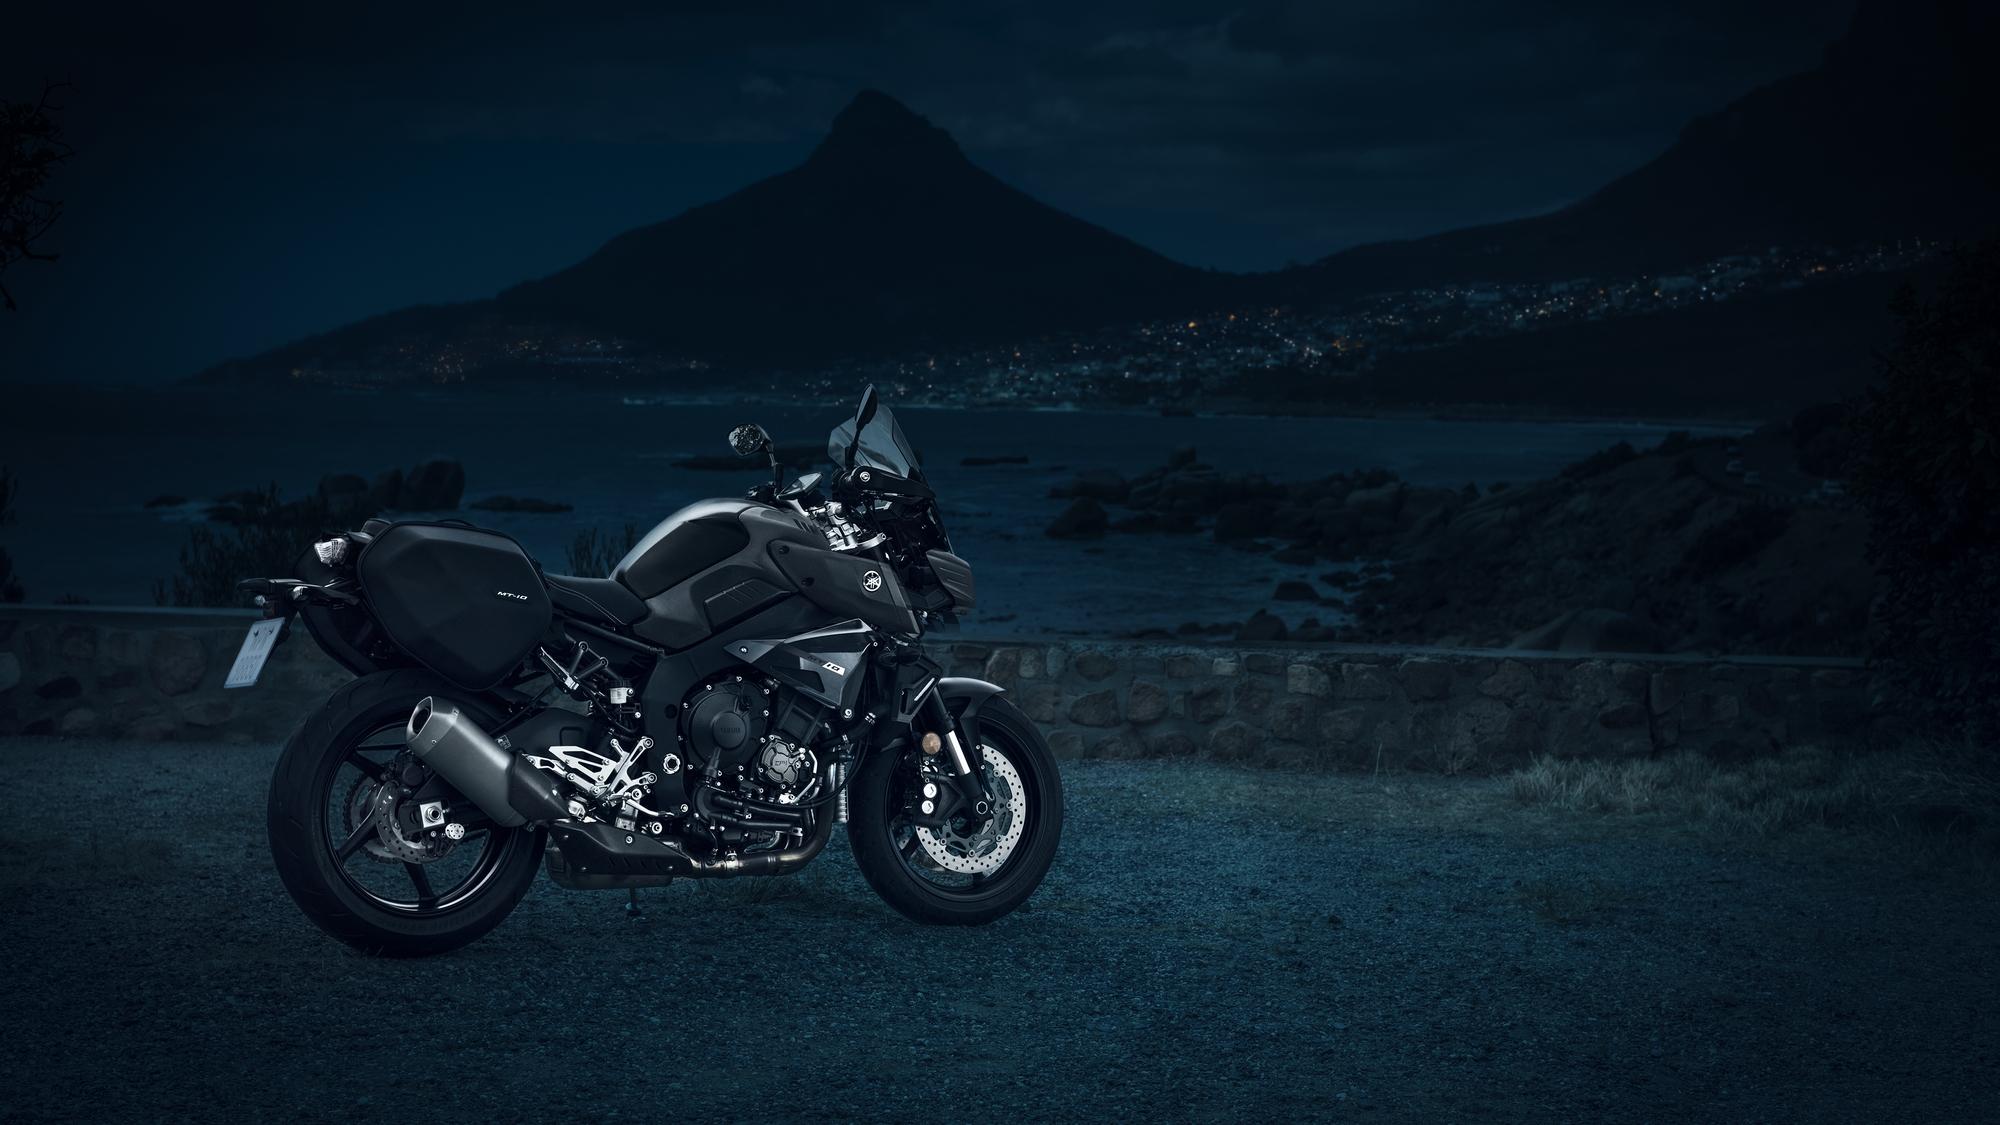 Yamaha MT-10 tourer edition πλαϊνή όψη φωτογράφιση στην θάλασσα